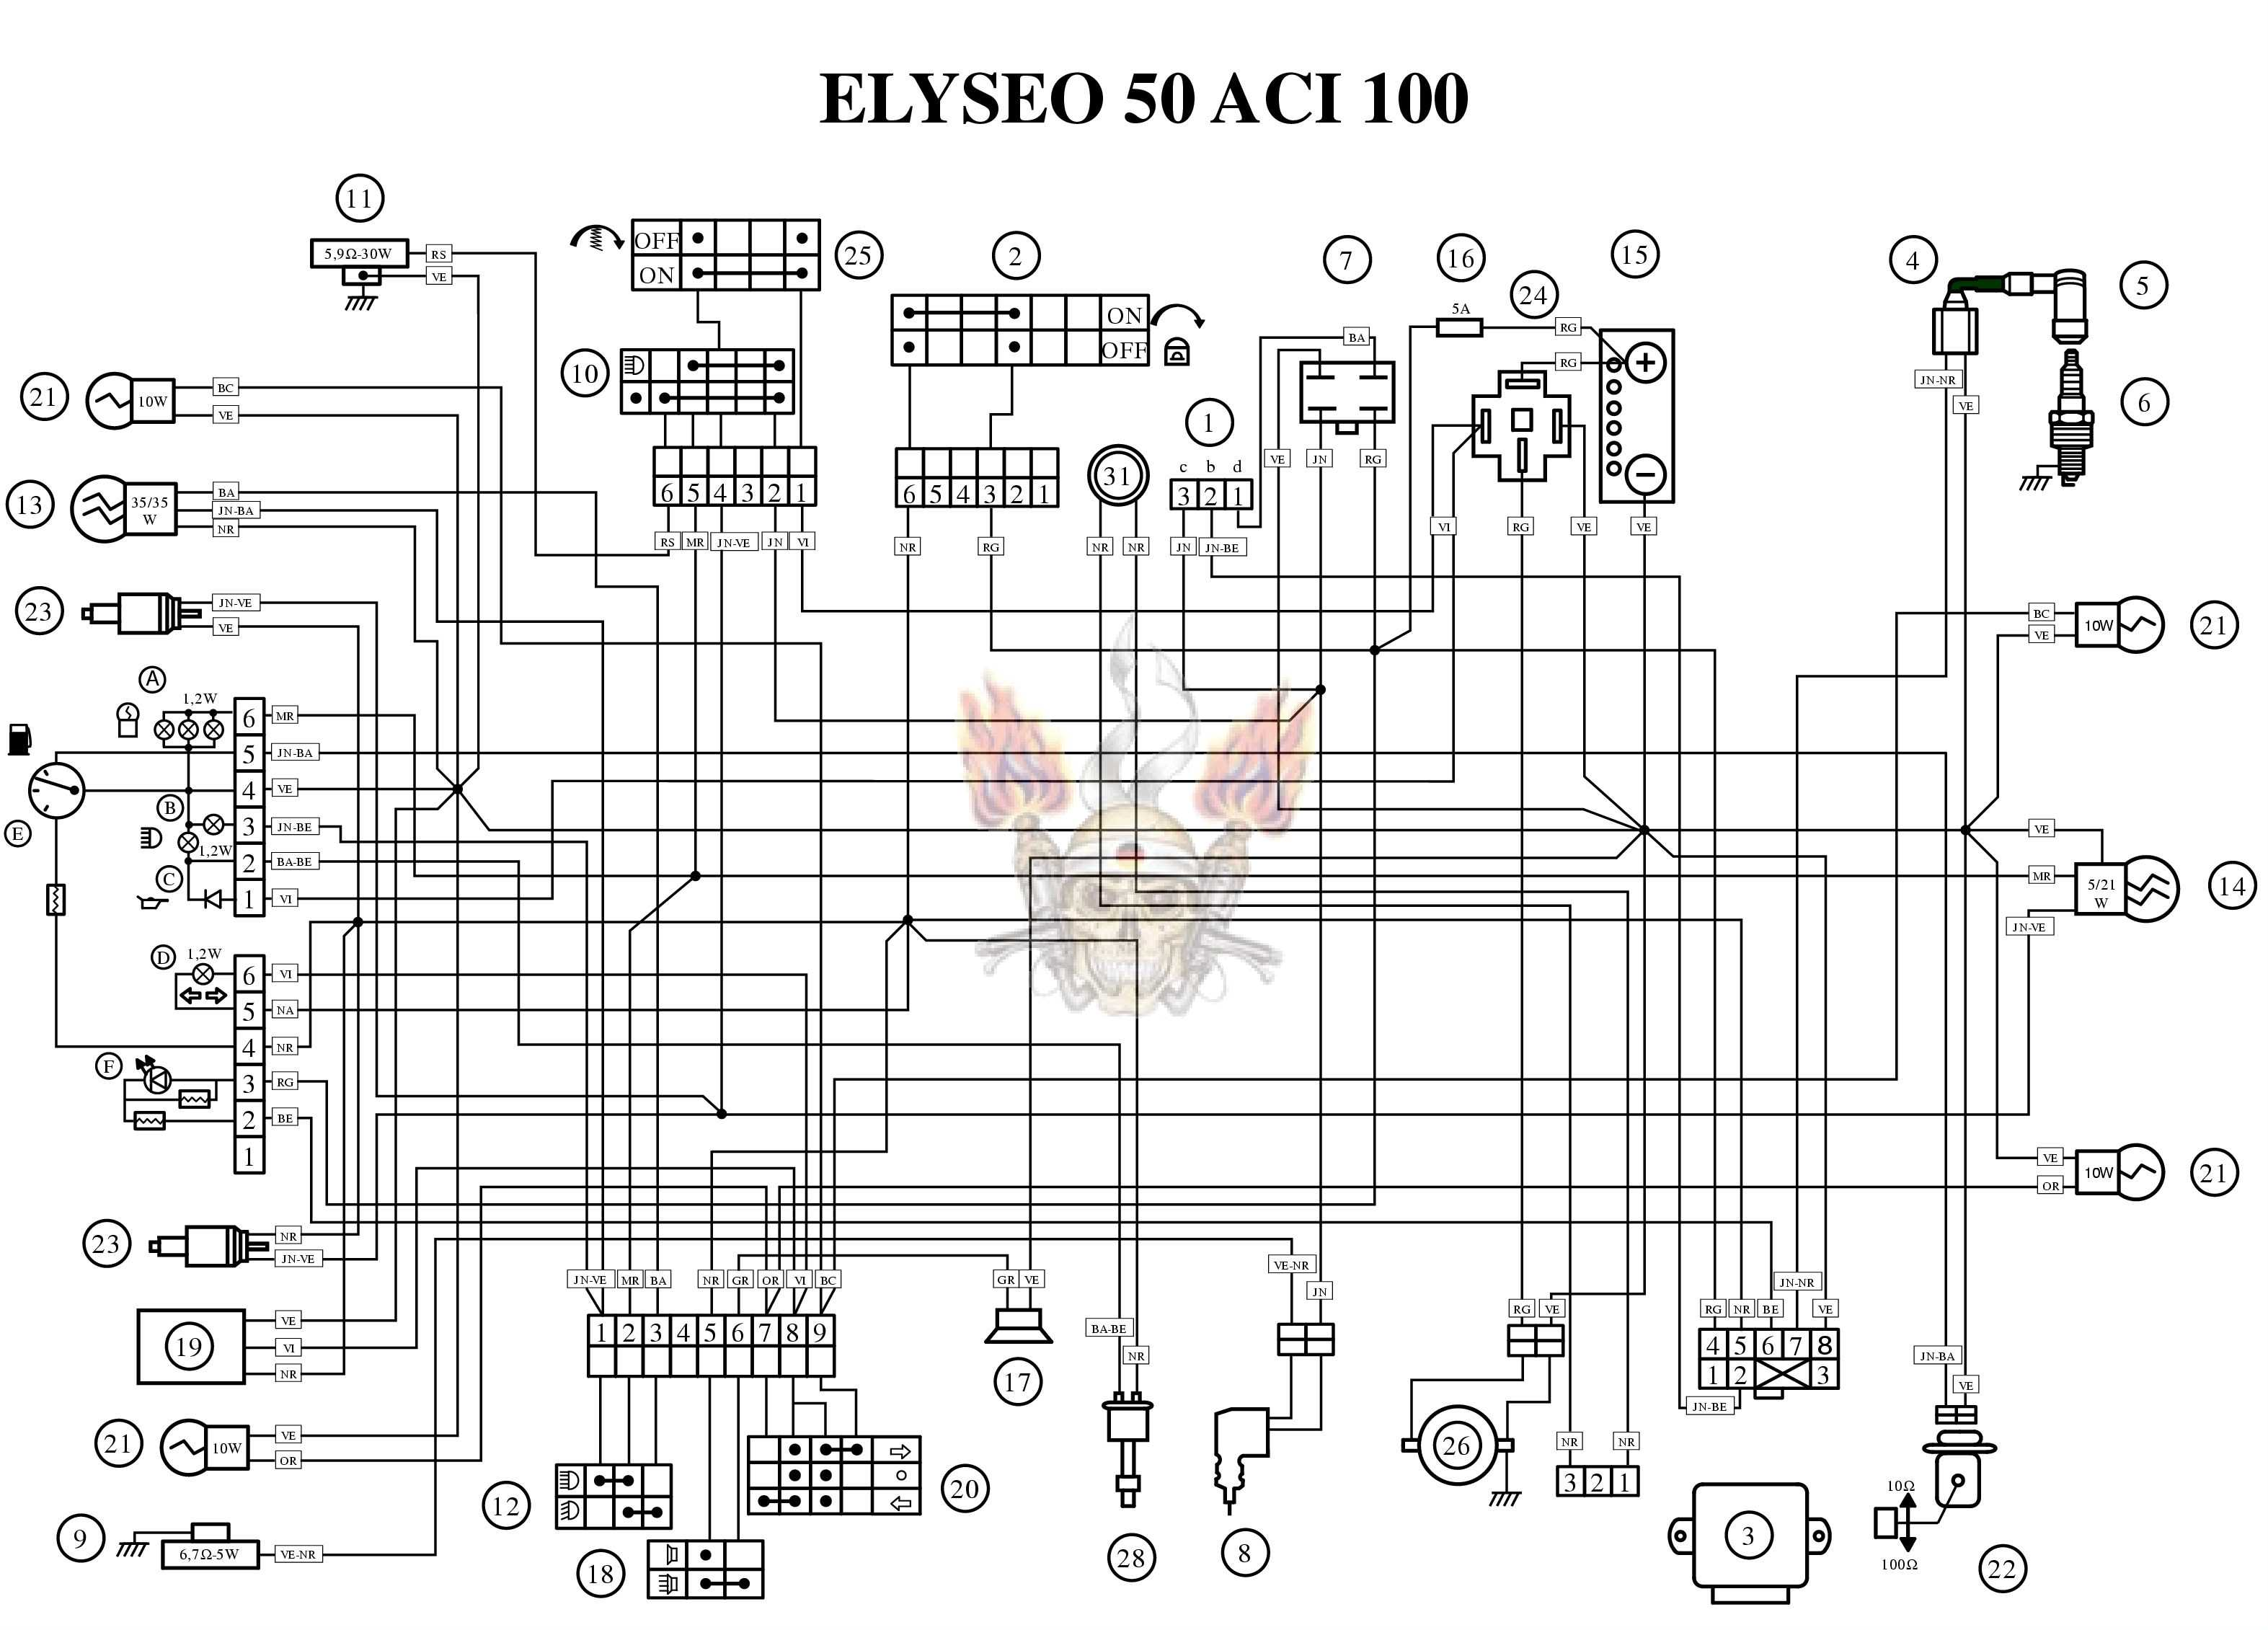 peugeot 807 wiring diagram free download somurich com rh somurich com